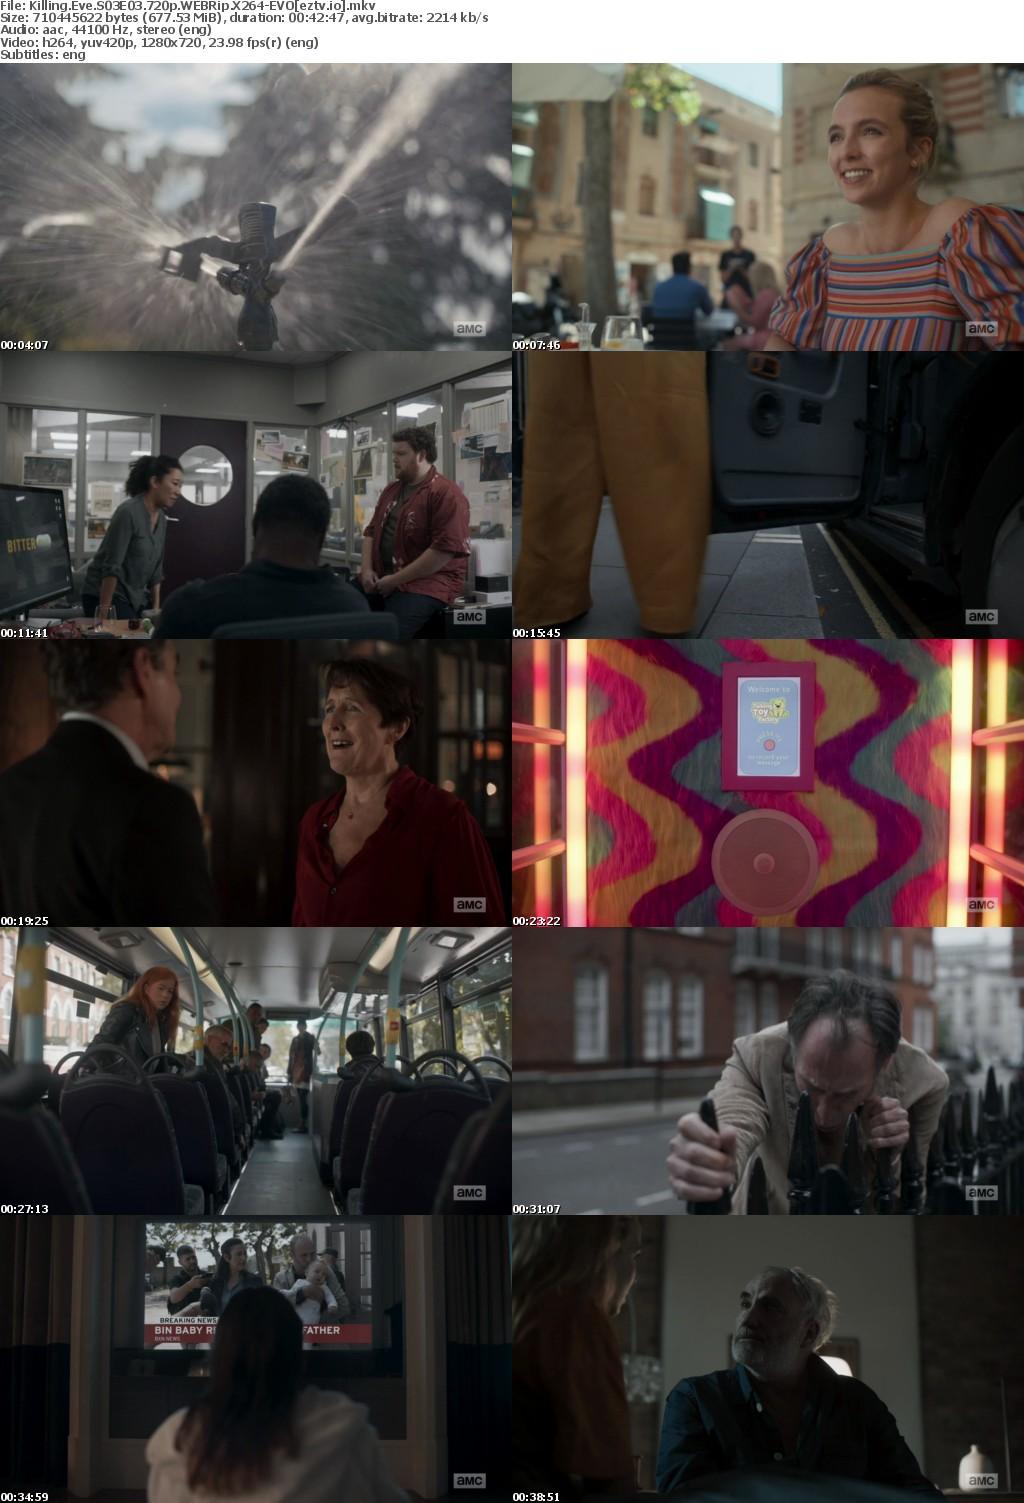 Killing Eve S03E03 720p WEBRip X264-EVO